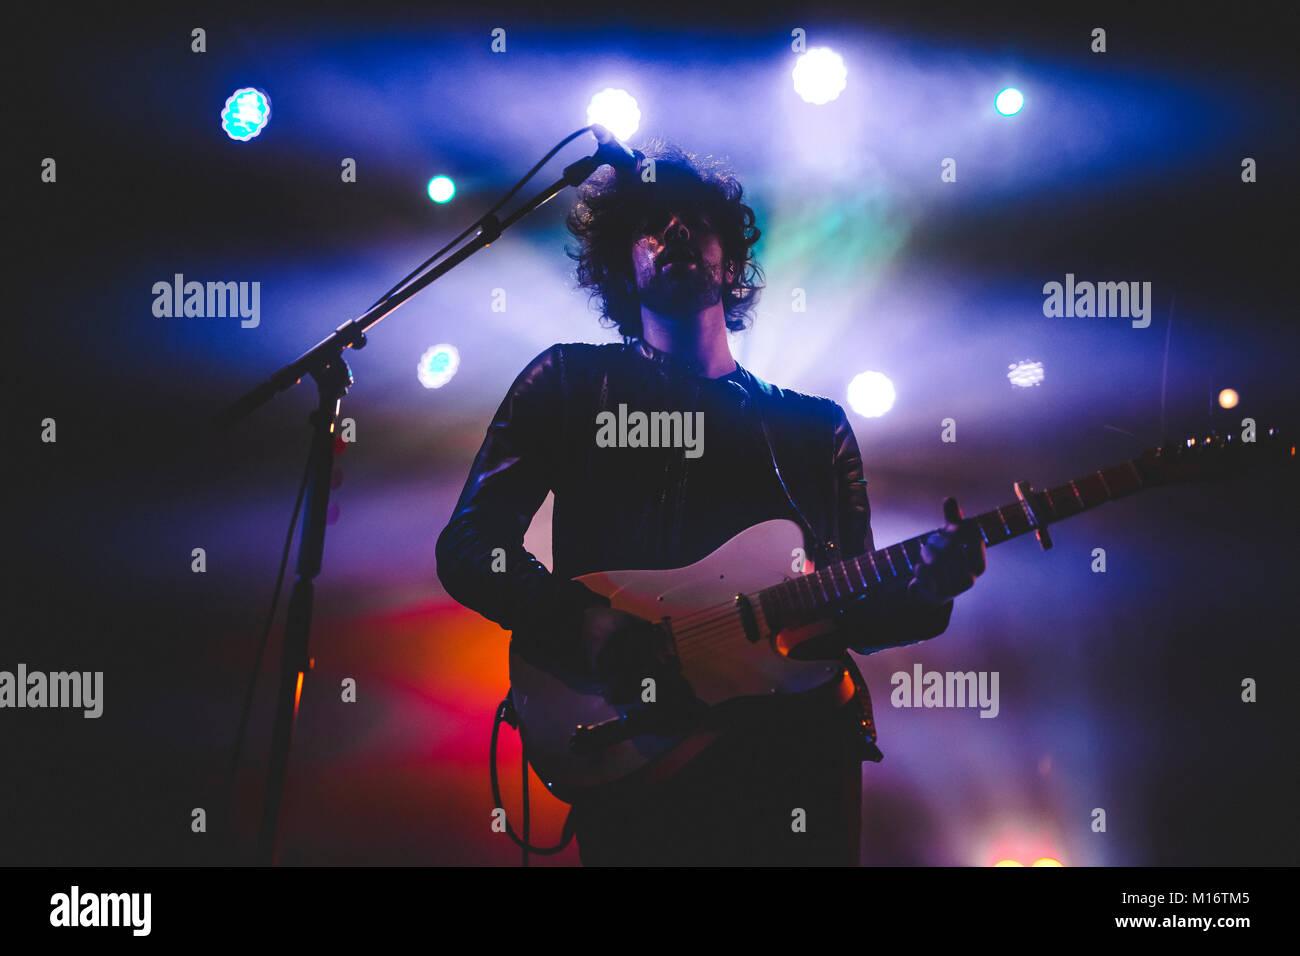 Bologna, Estragon Club 26.01.2018. Canova italian indie rock band performing in Avete Ragione Club Tour Credit Luigi Stock Photo